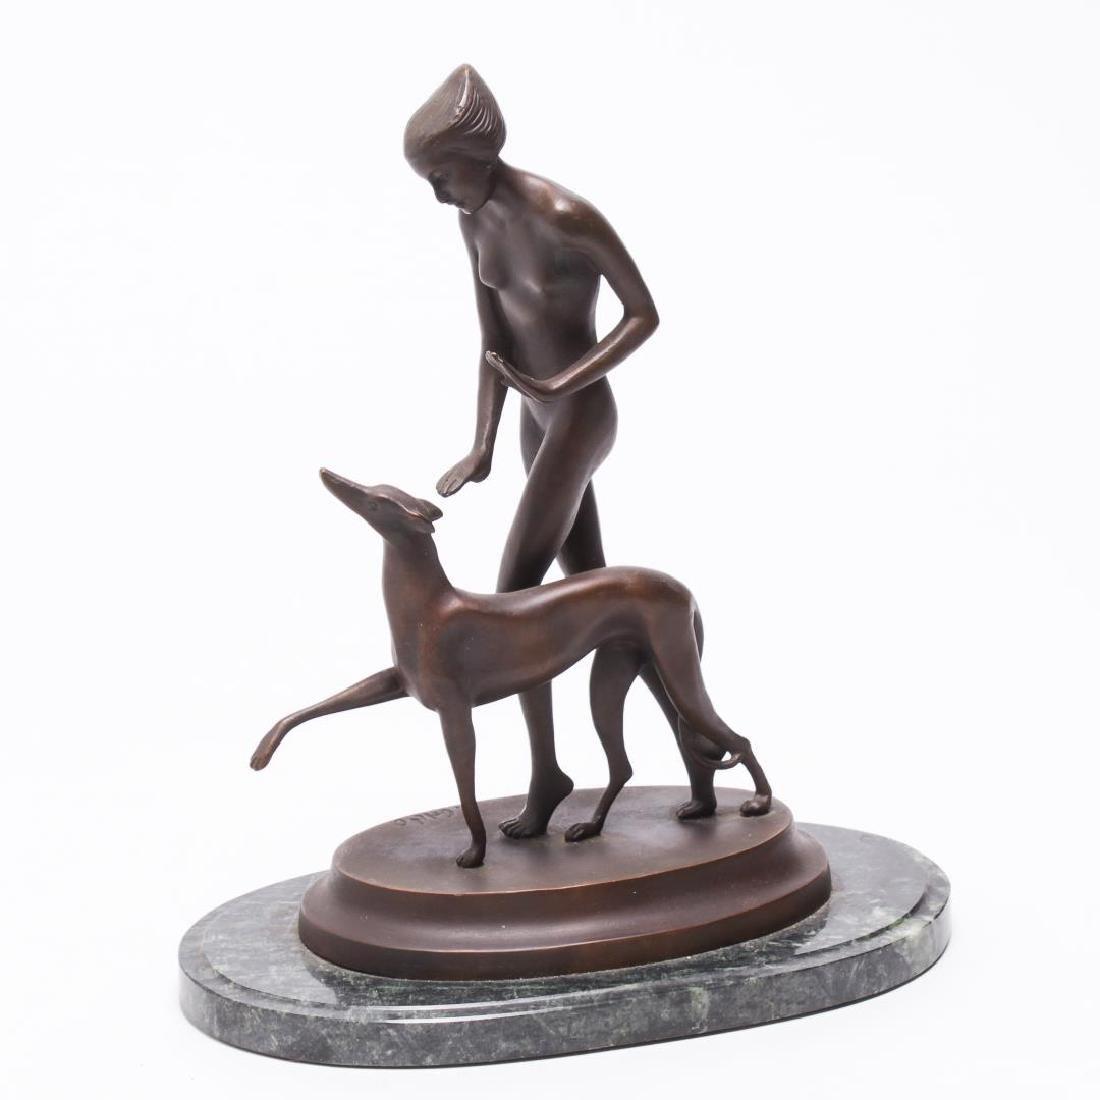 Ignacio Gallo (Spanish, d. 1935)- Art Deco Bronze